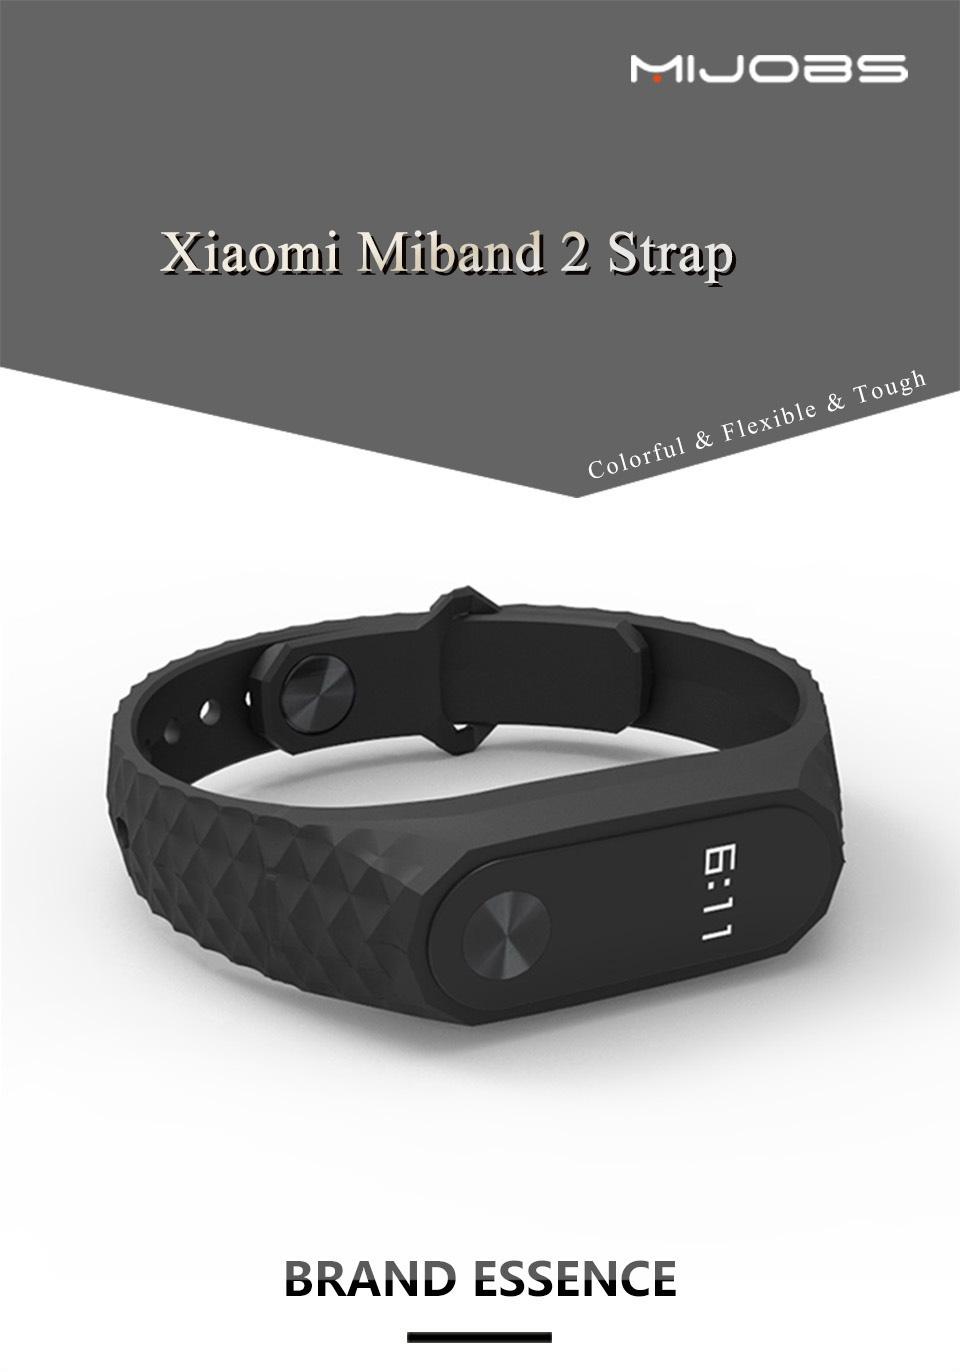 Mijobs Xiaomi Mi Band 2 Strap Silicone Strap Bracelet Replacement Wristband Smart Band Accessories Colorful wrist Strap 2